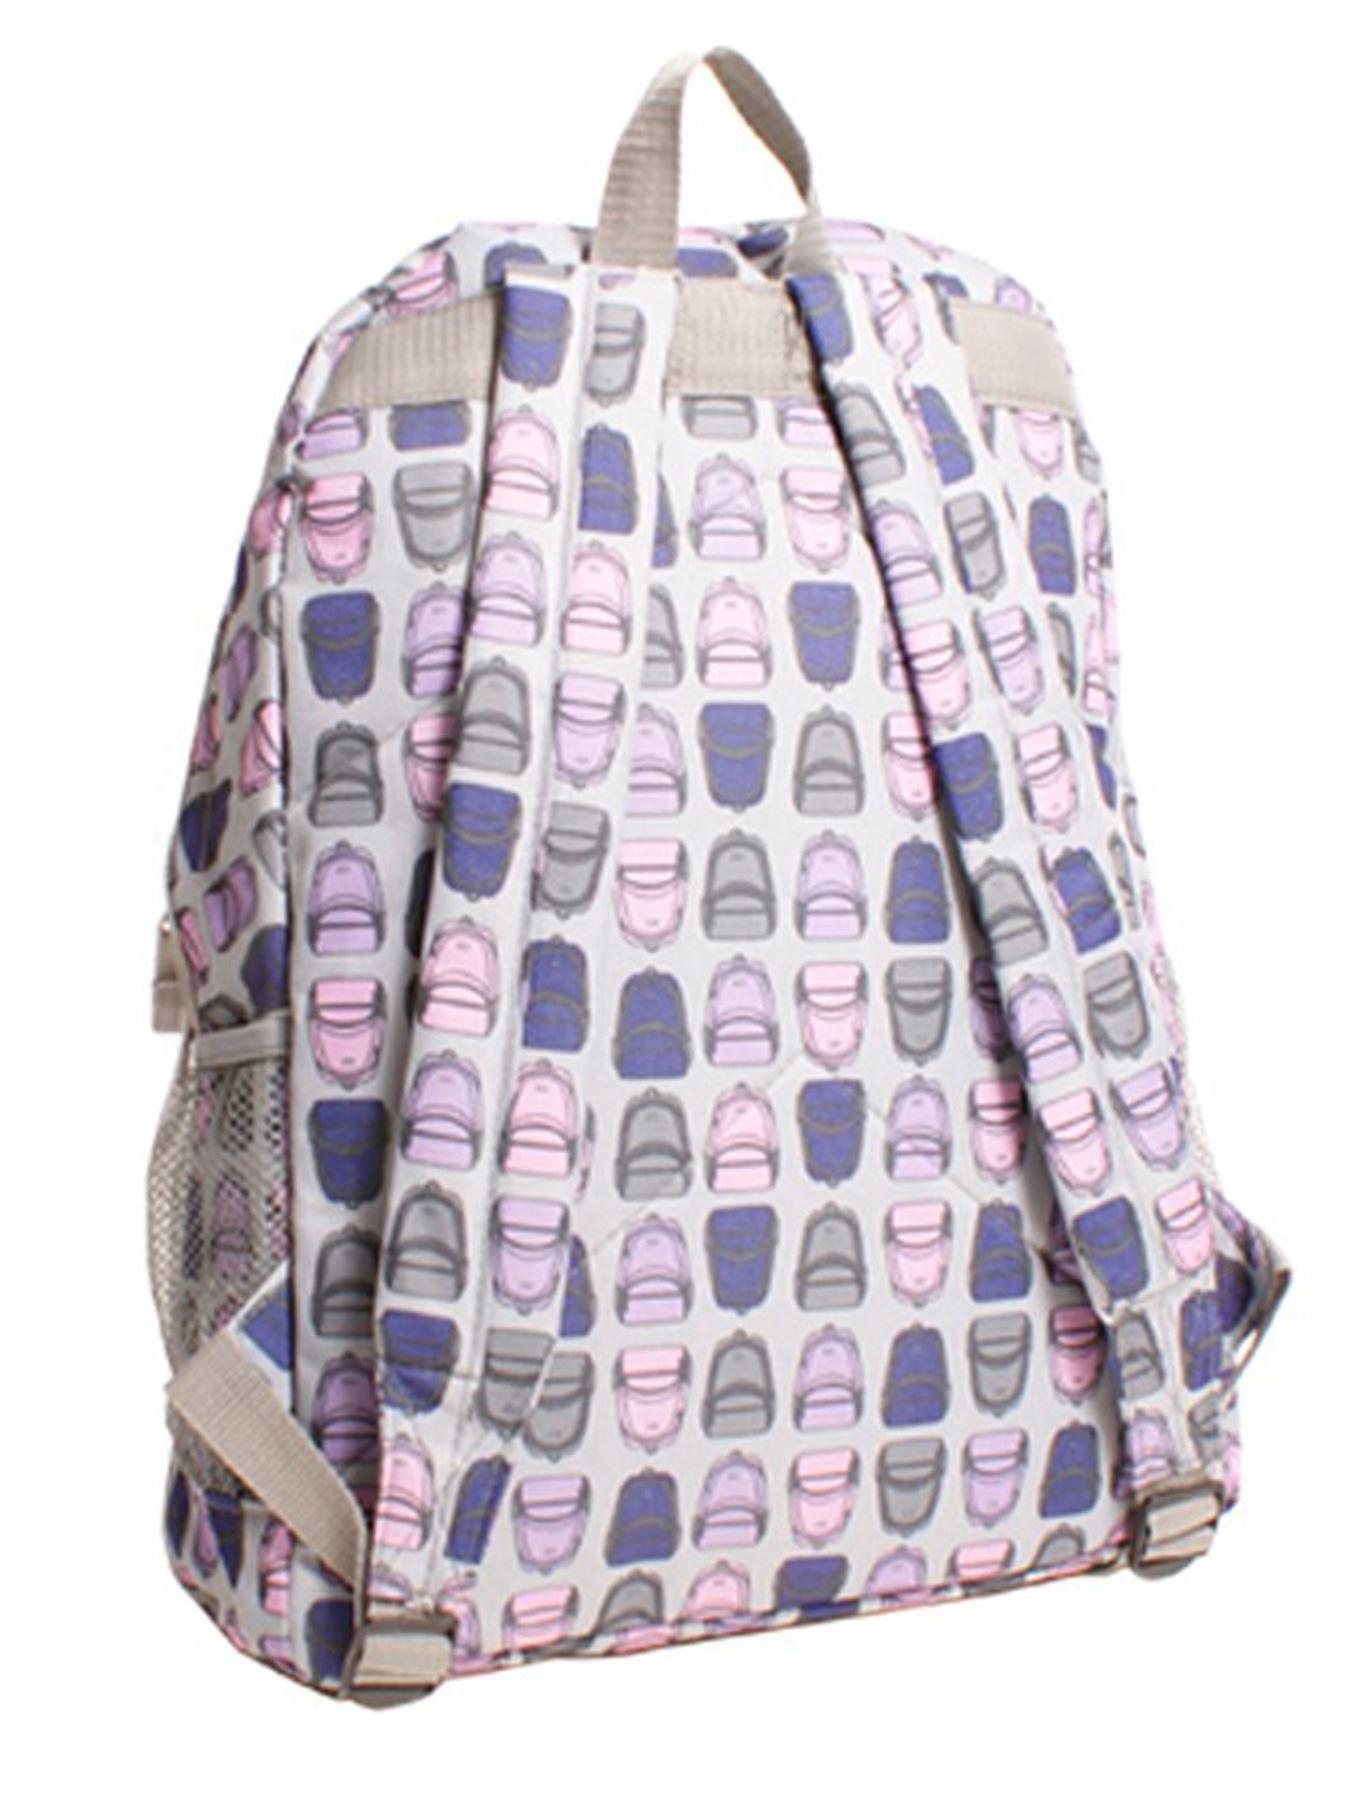 Hi-Tec-Mens-Ladies-Printed-Backpack-Rucksack-School-College-Gym-Hand-Travel-Bag thumbnail 6